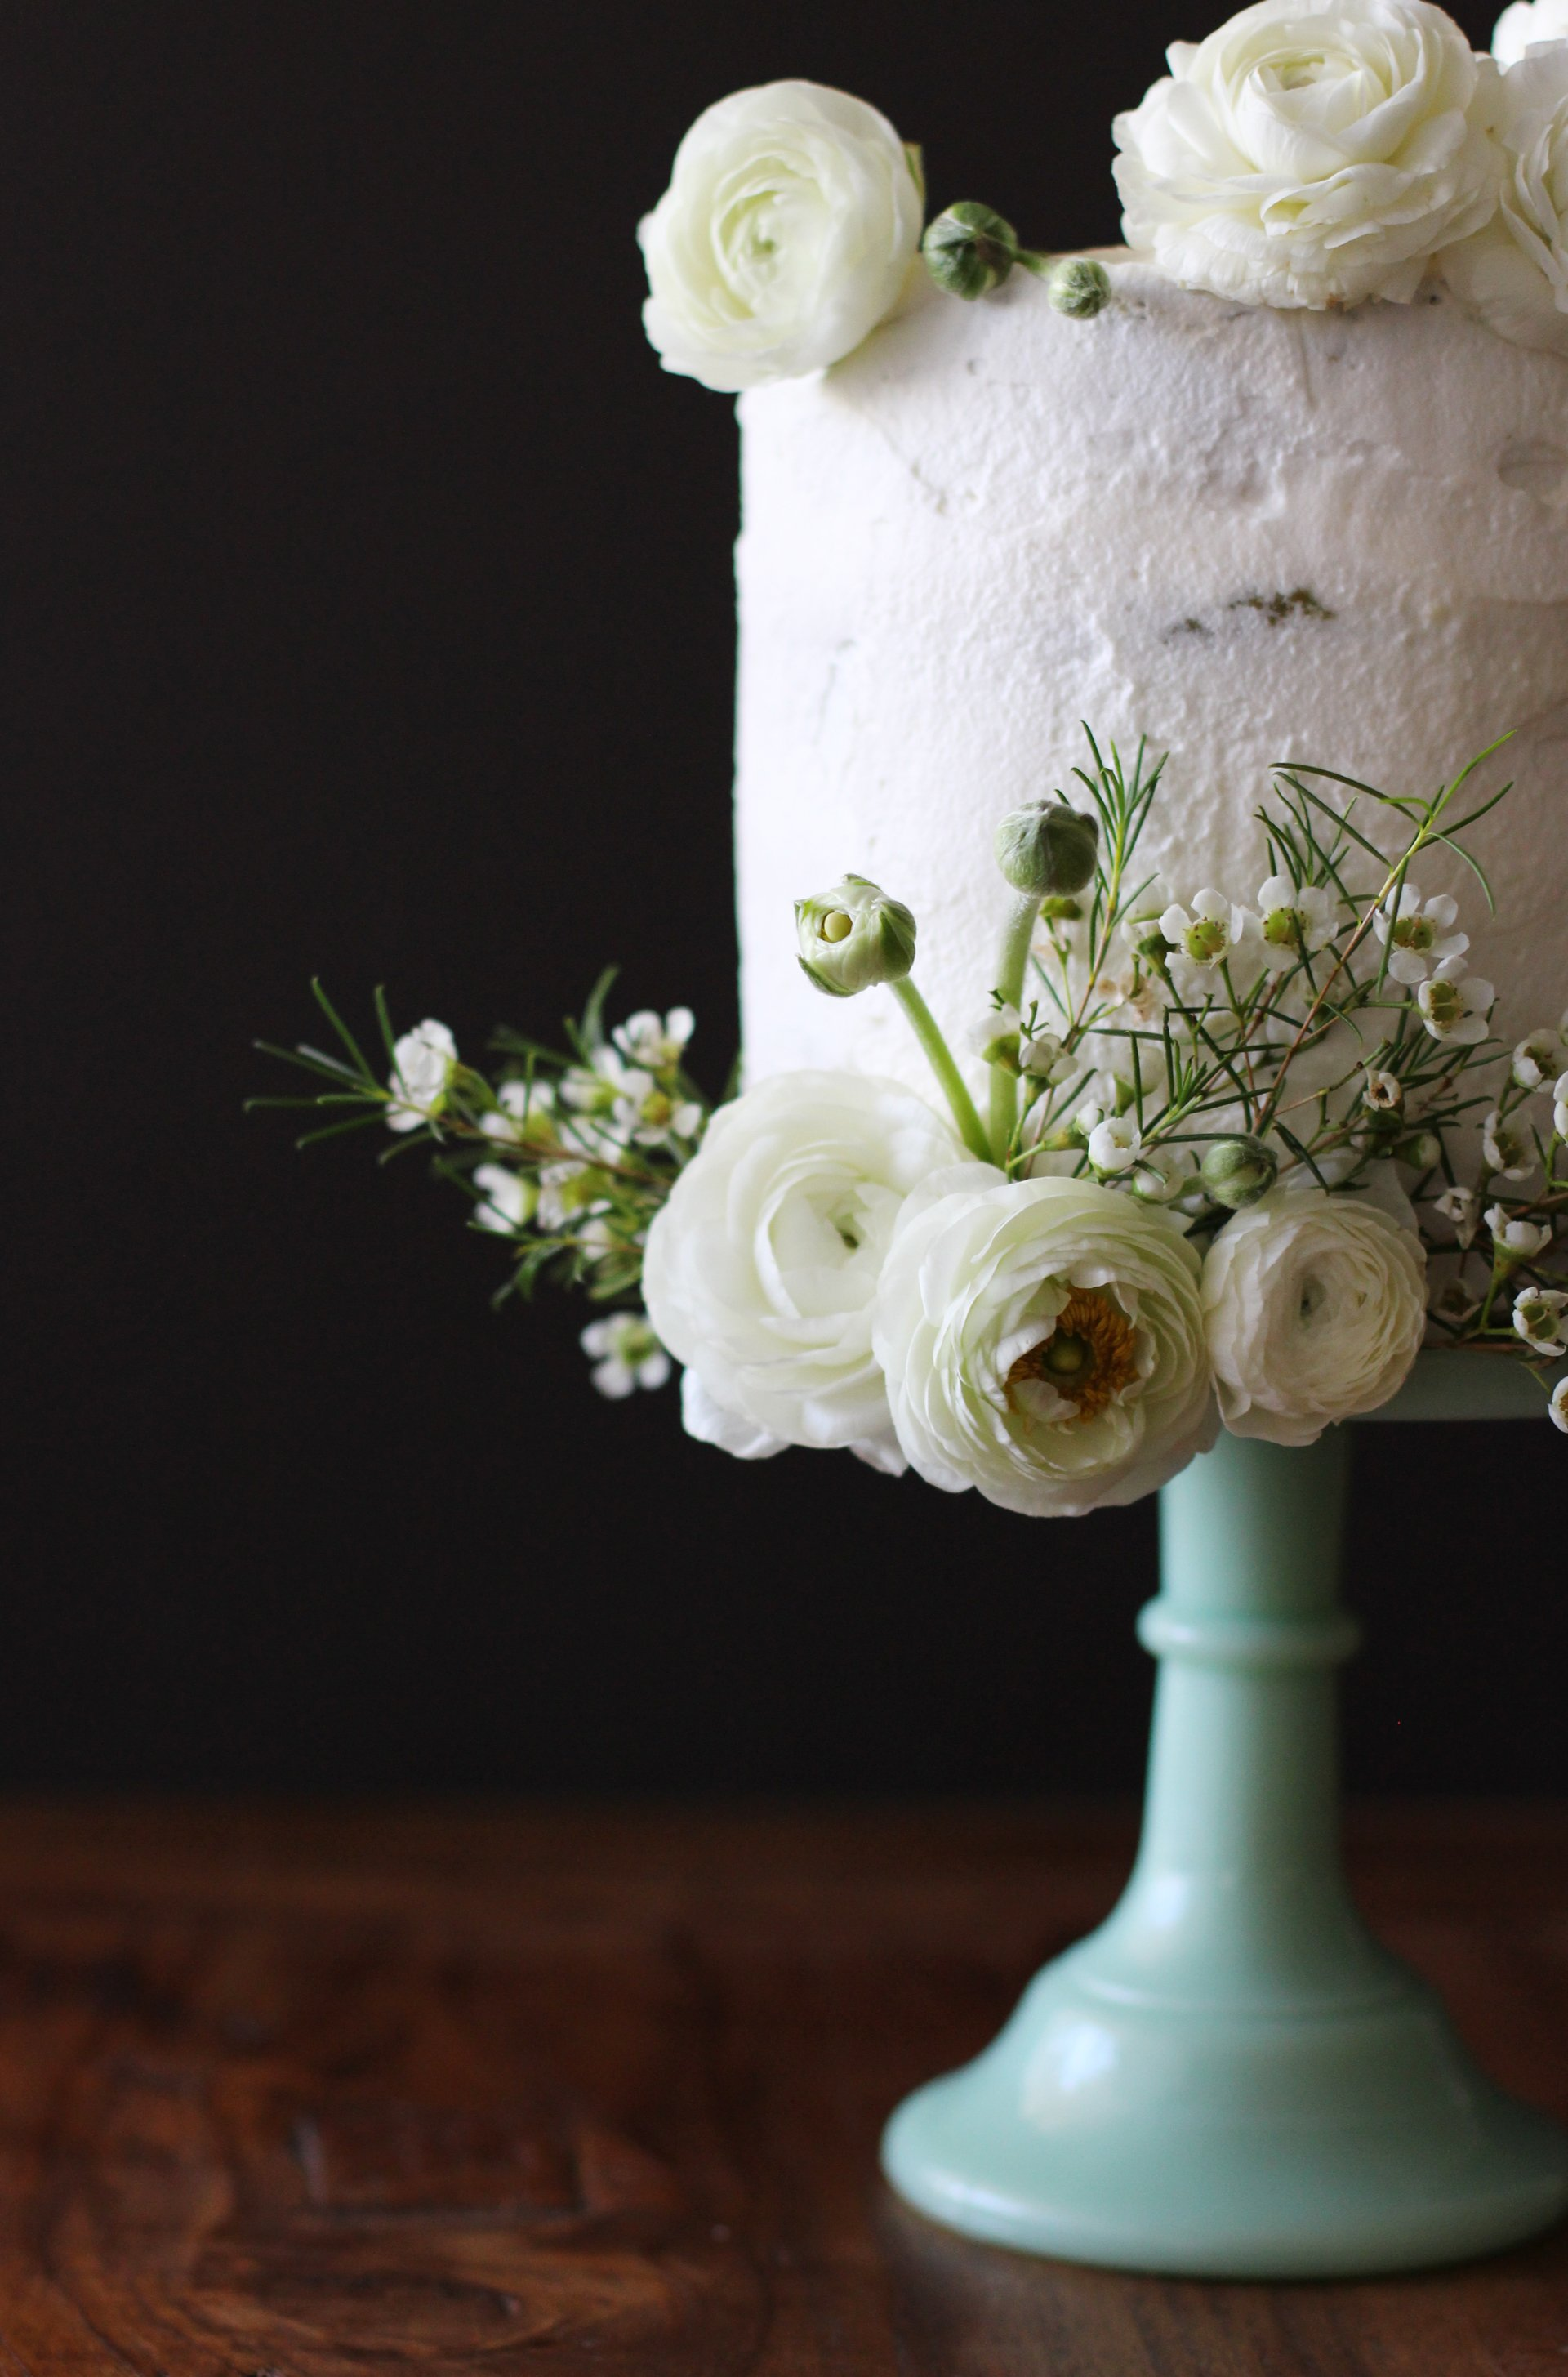 Green tea and white chocolate cake | HonestlyYUM